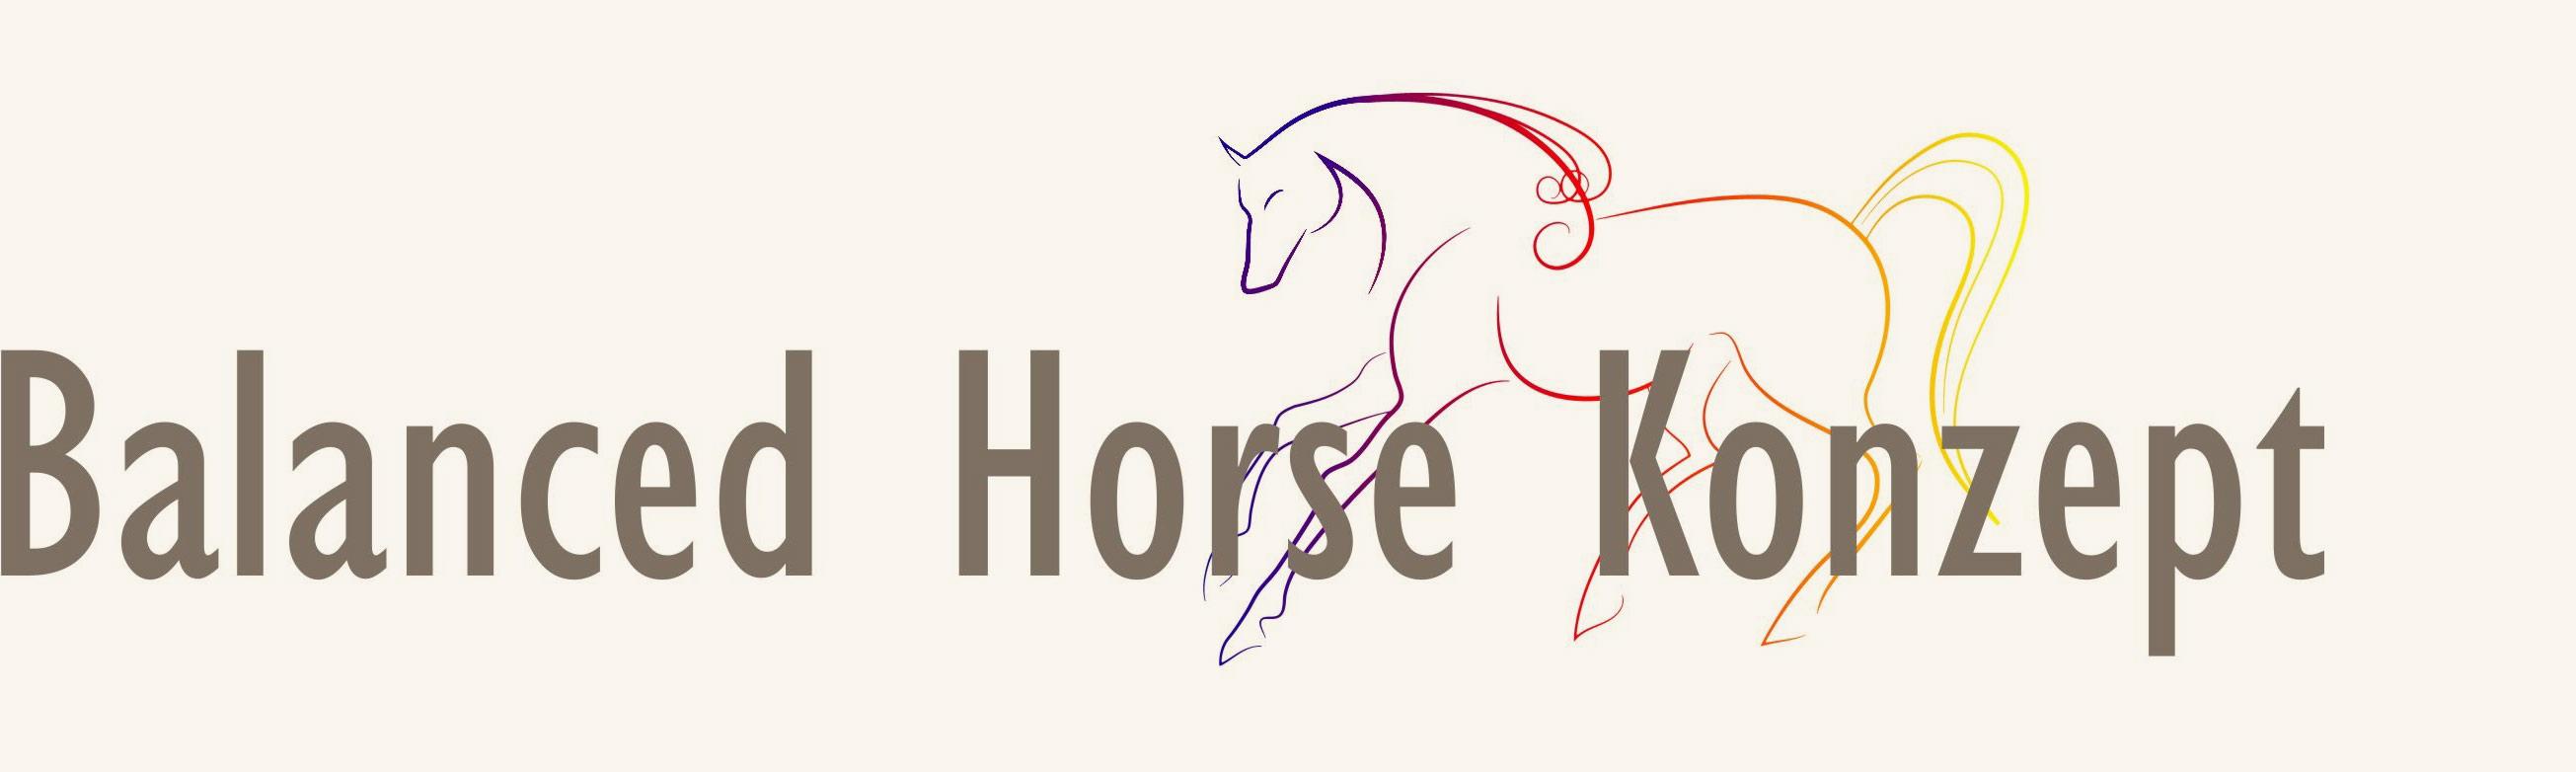 Balanced-Horse-Konzept-Hannah-Beate-Koenig